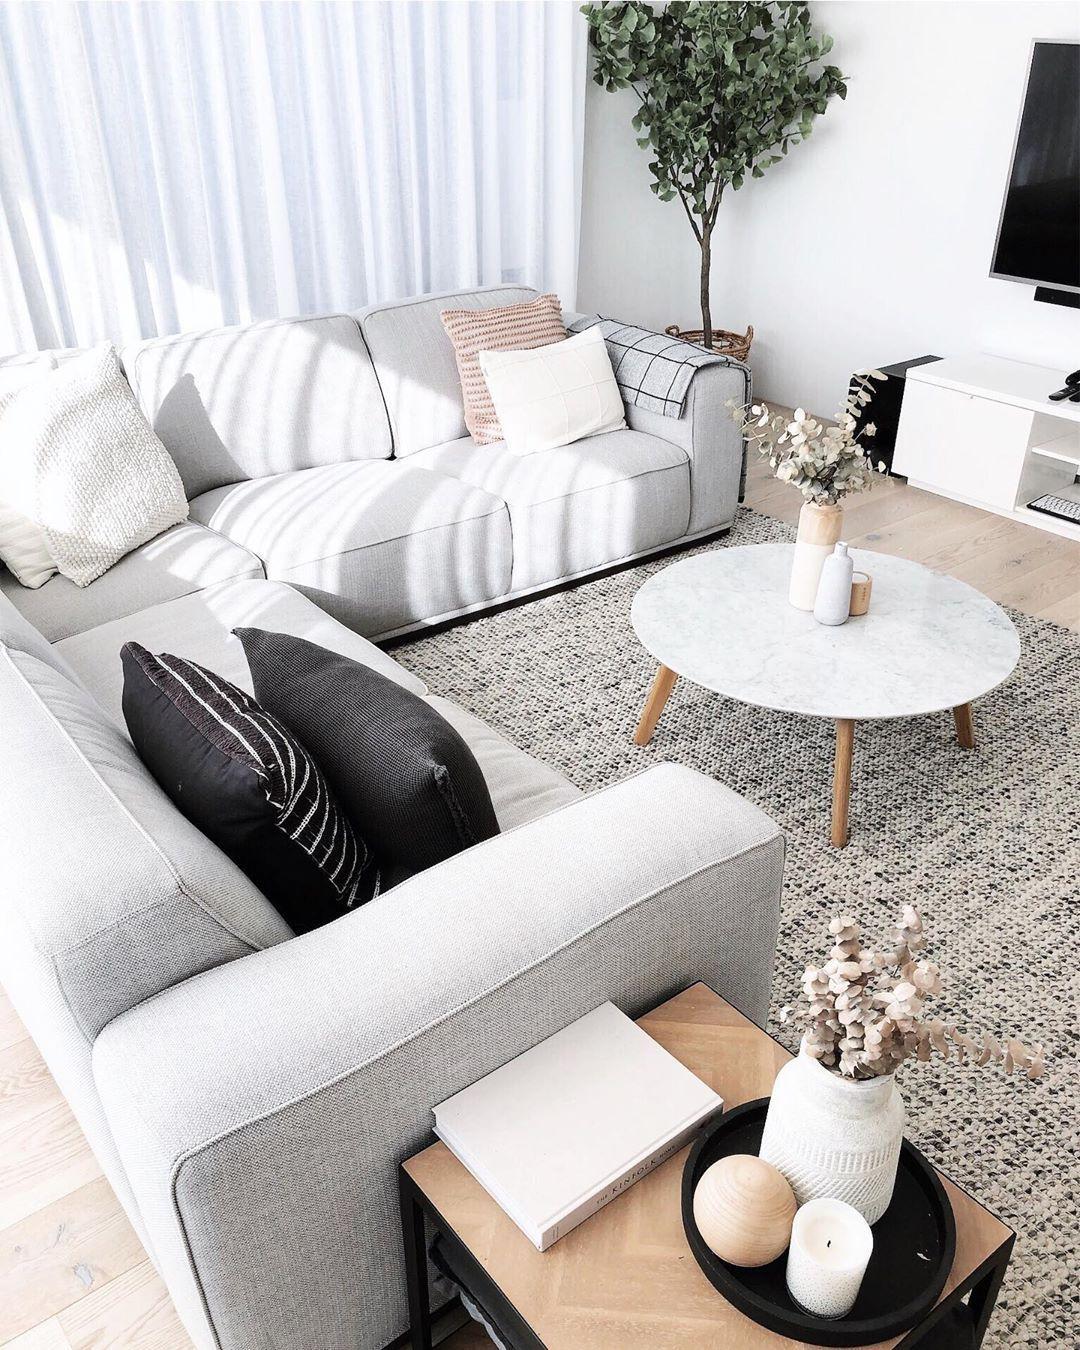 20 Best Modern Living Room Decor Ideas Living Room Inspo Living Room Designs Home Decor